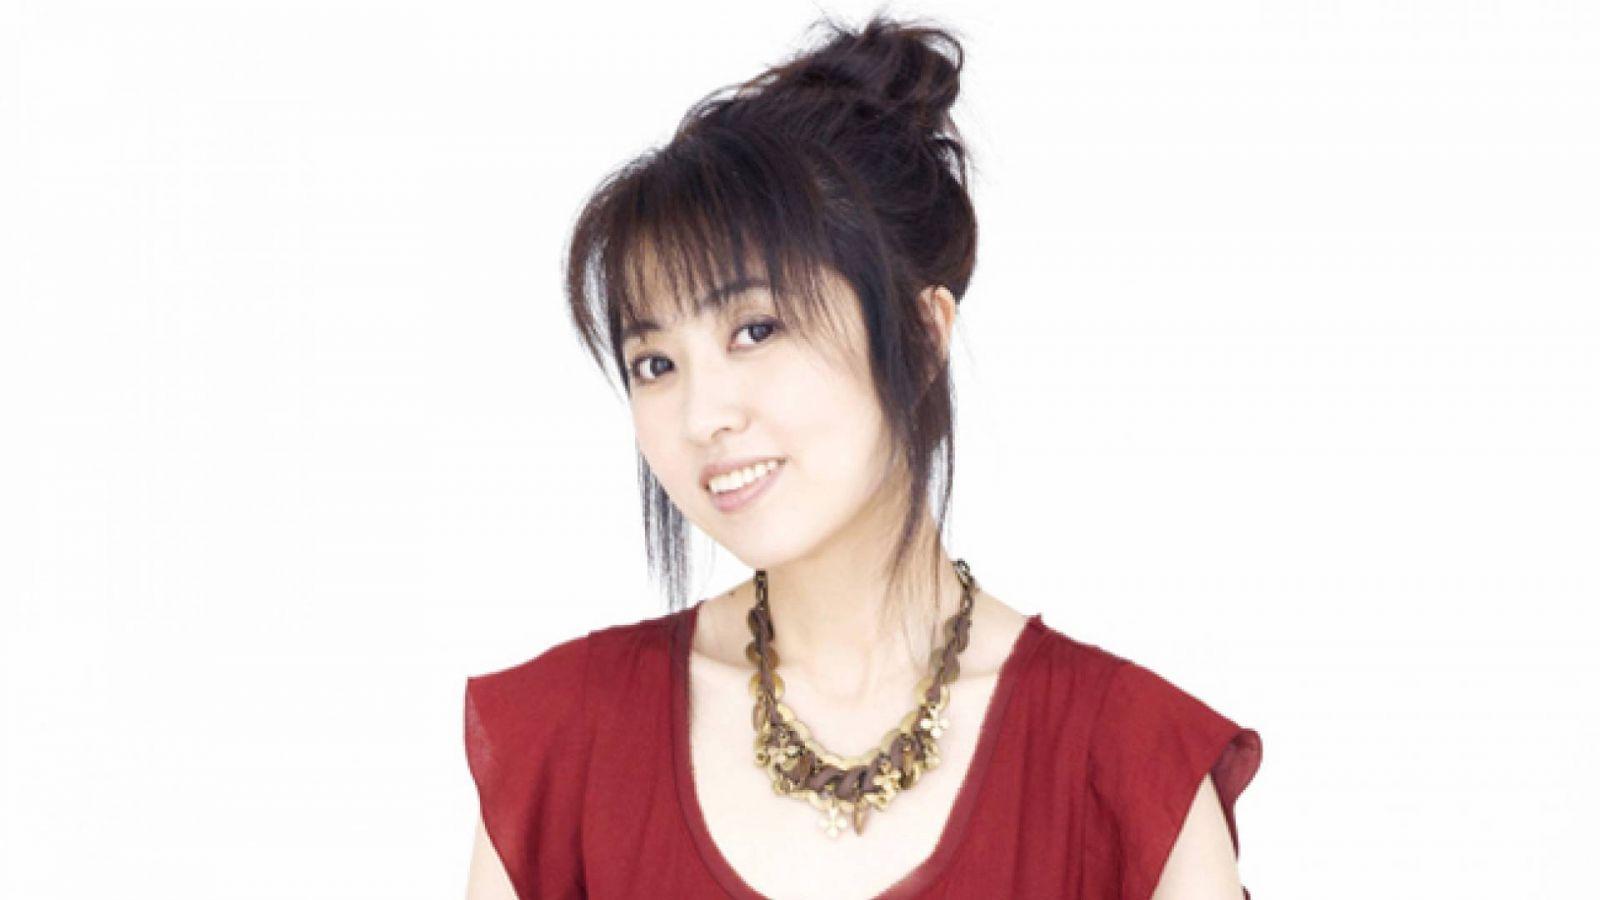 Megumi Hayashibara © Hayashibara Megumi. All rights reserved.